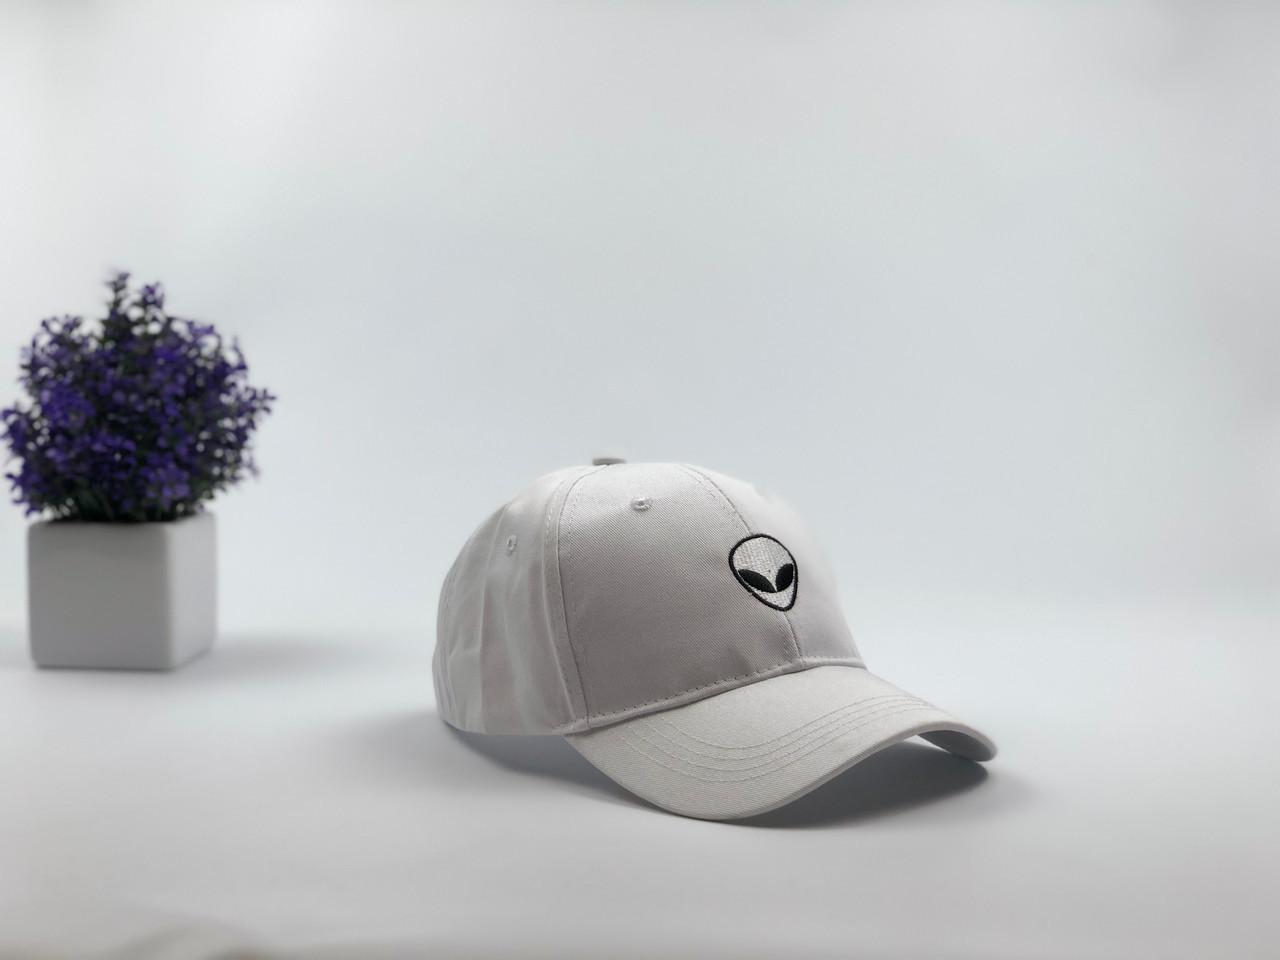 Кепка бейсболка Alien белая